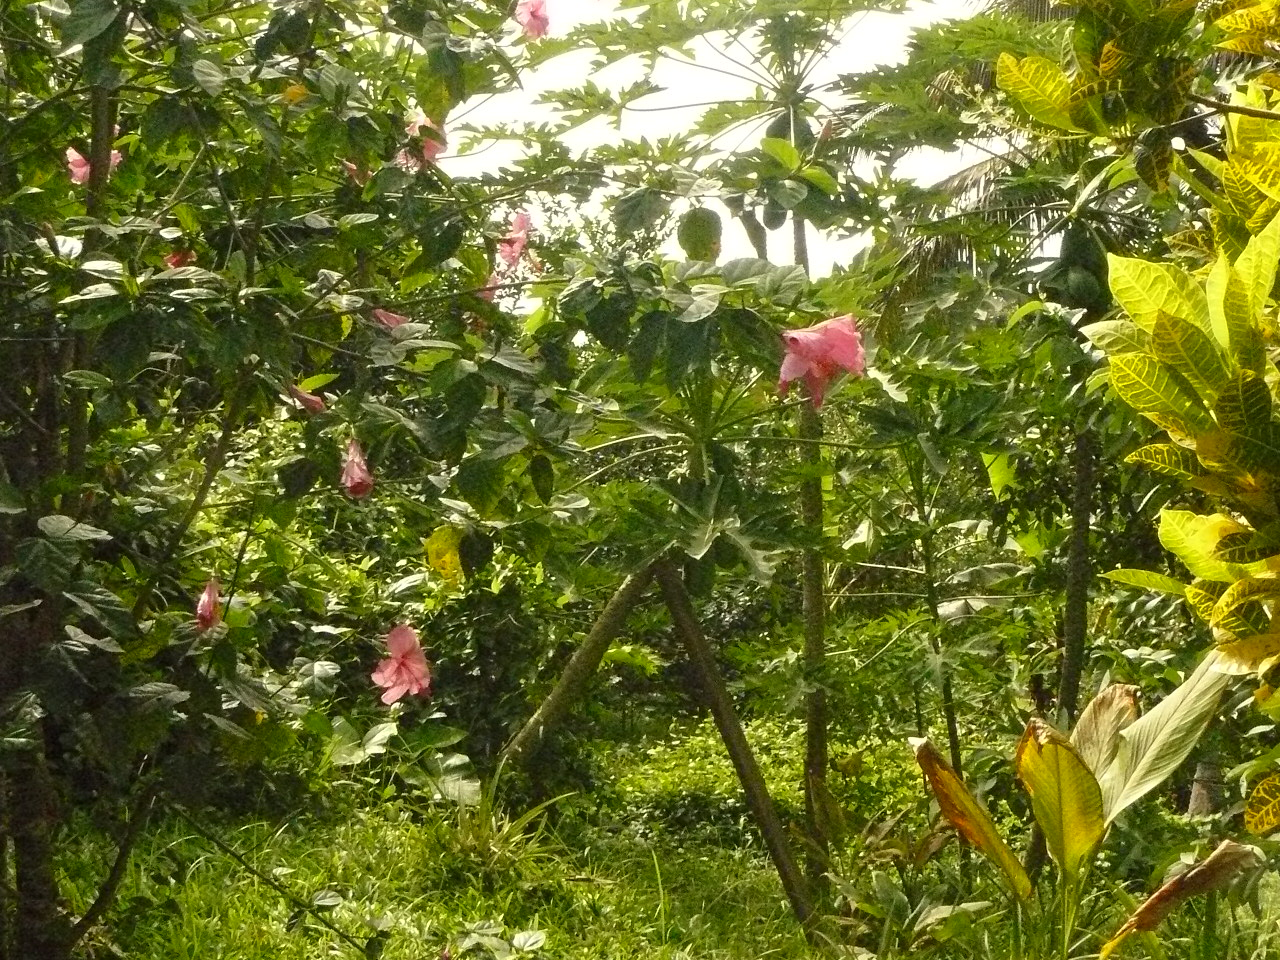 Mayotte_Combani_Relais Forestier_11